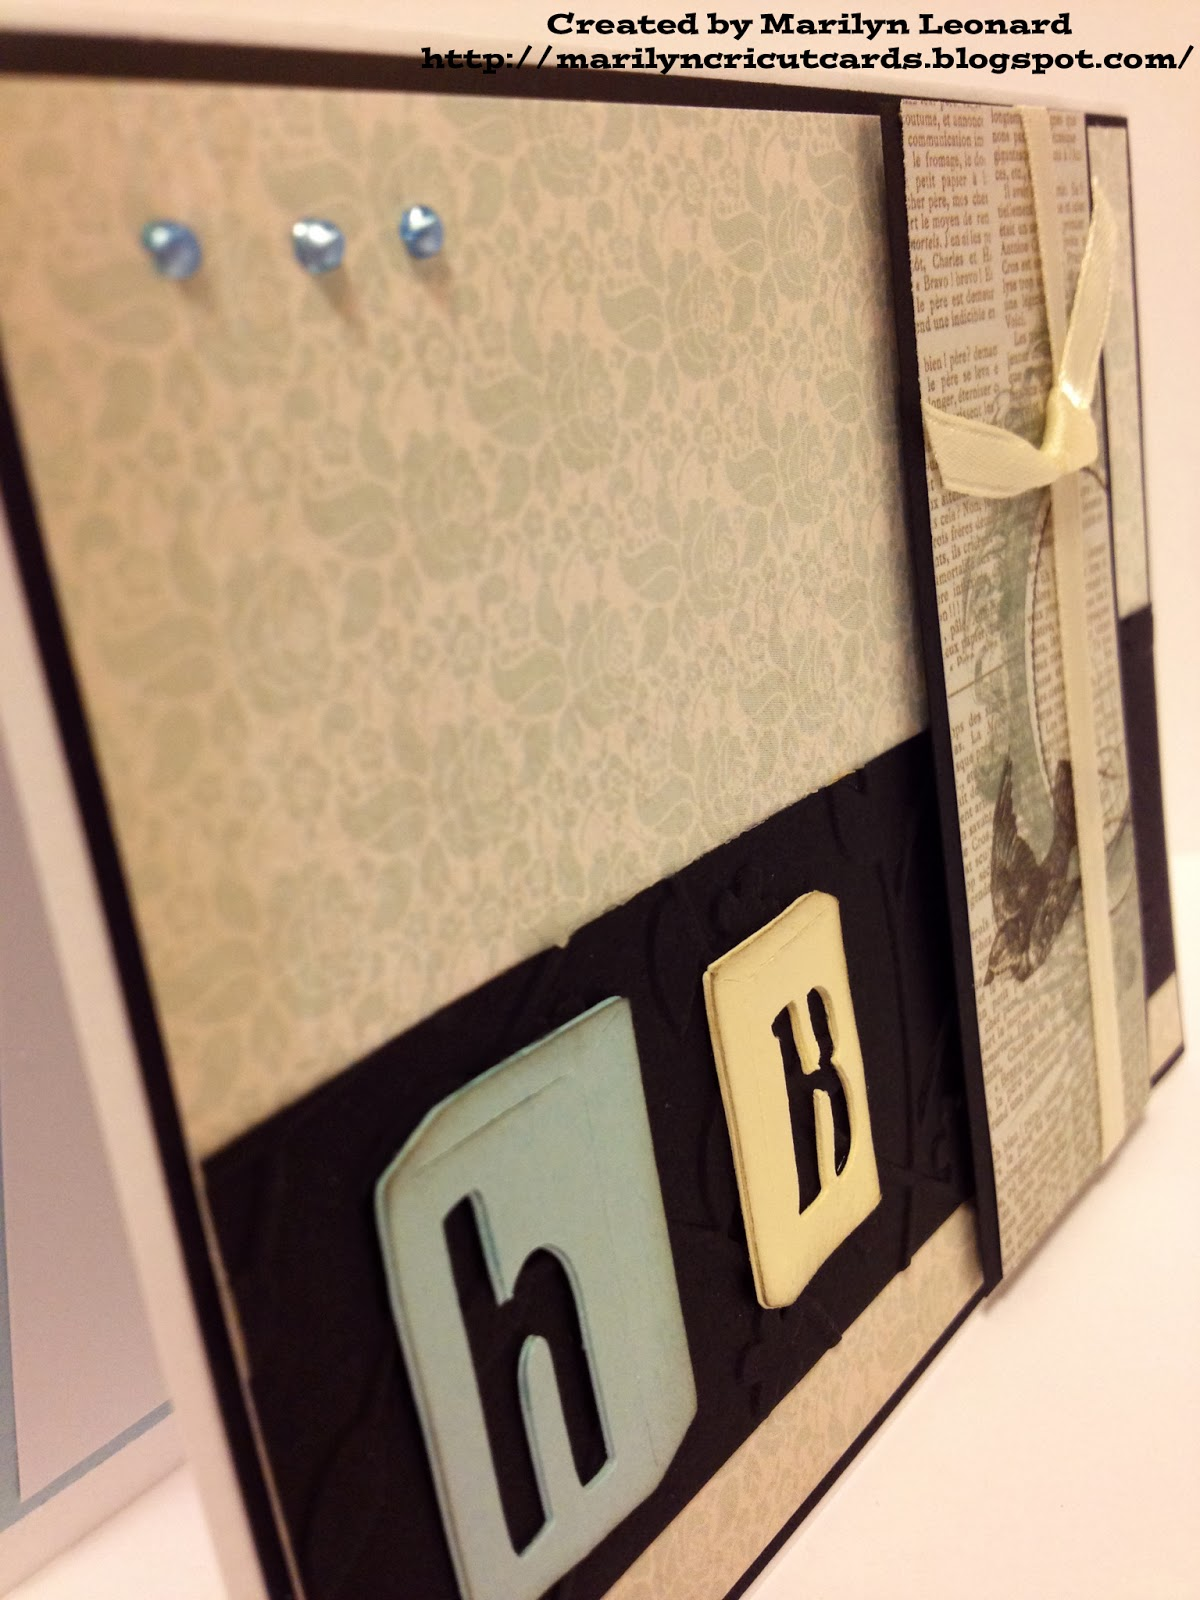 Printing Press Cricut Cartridge